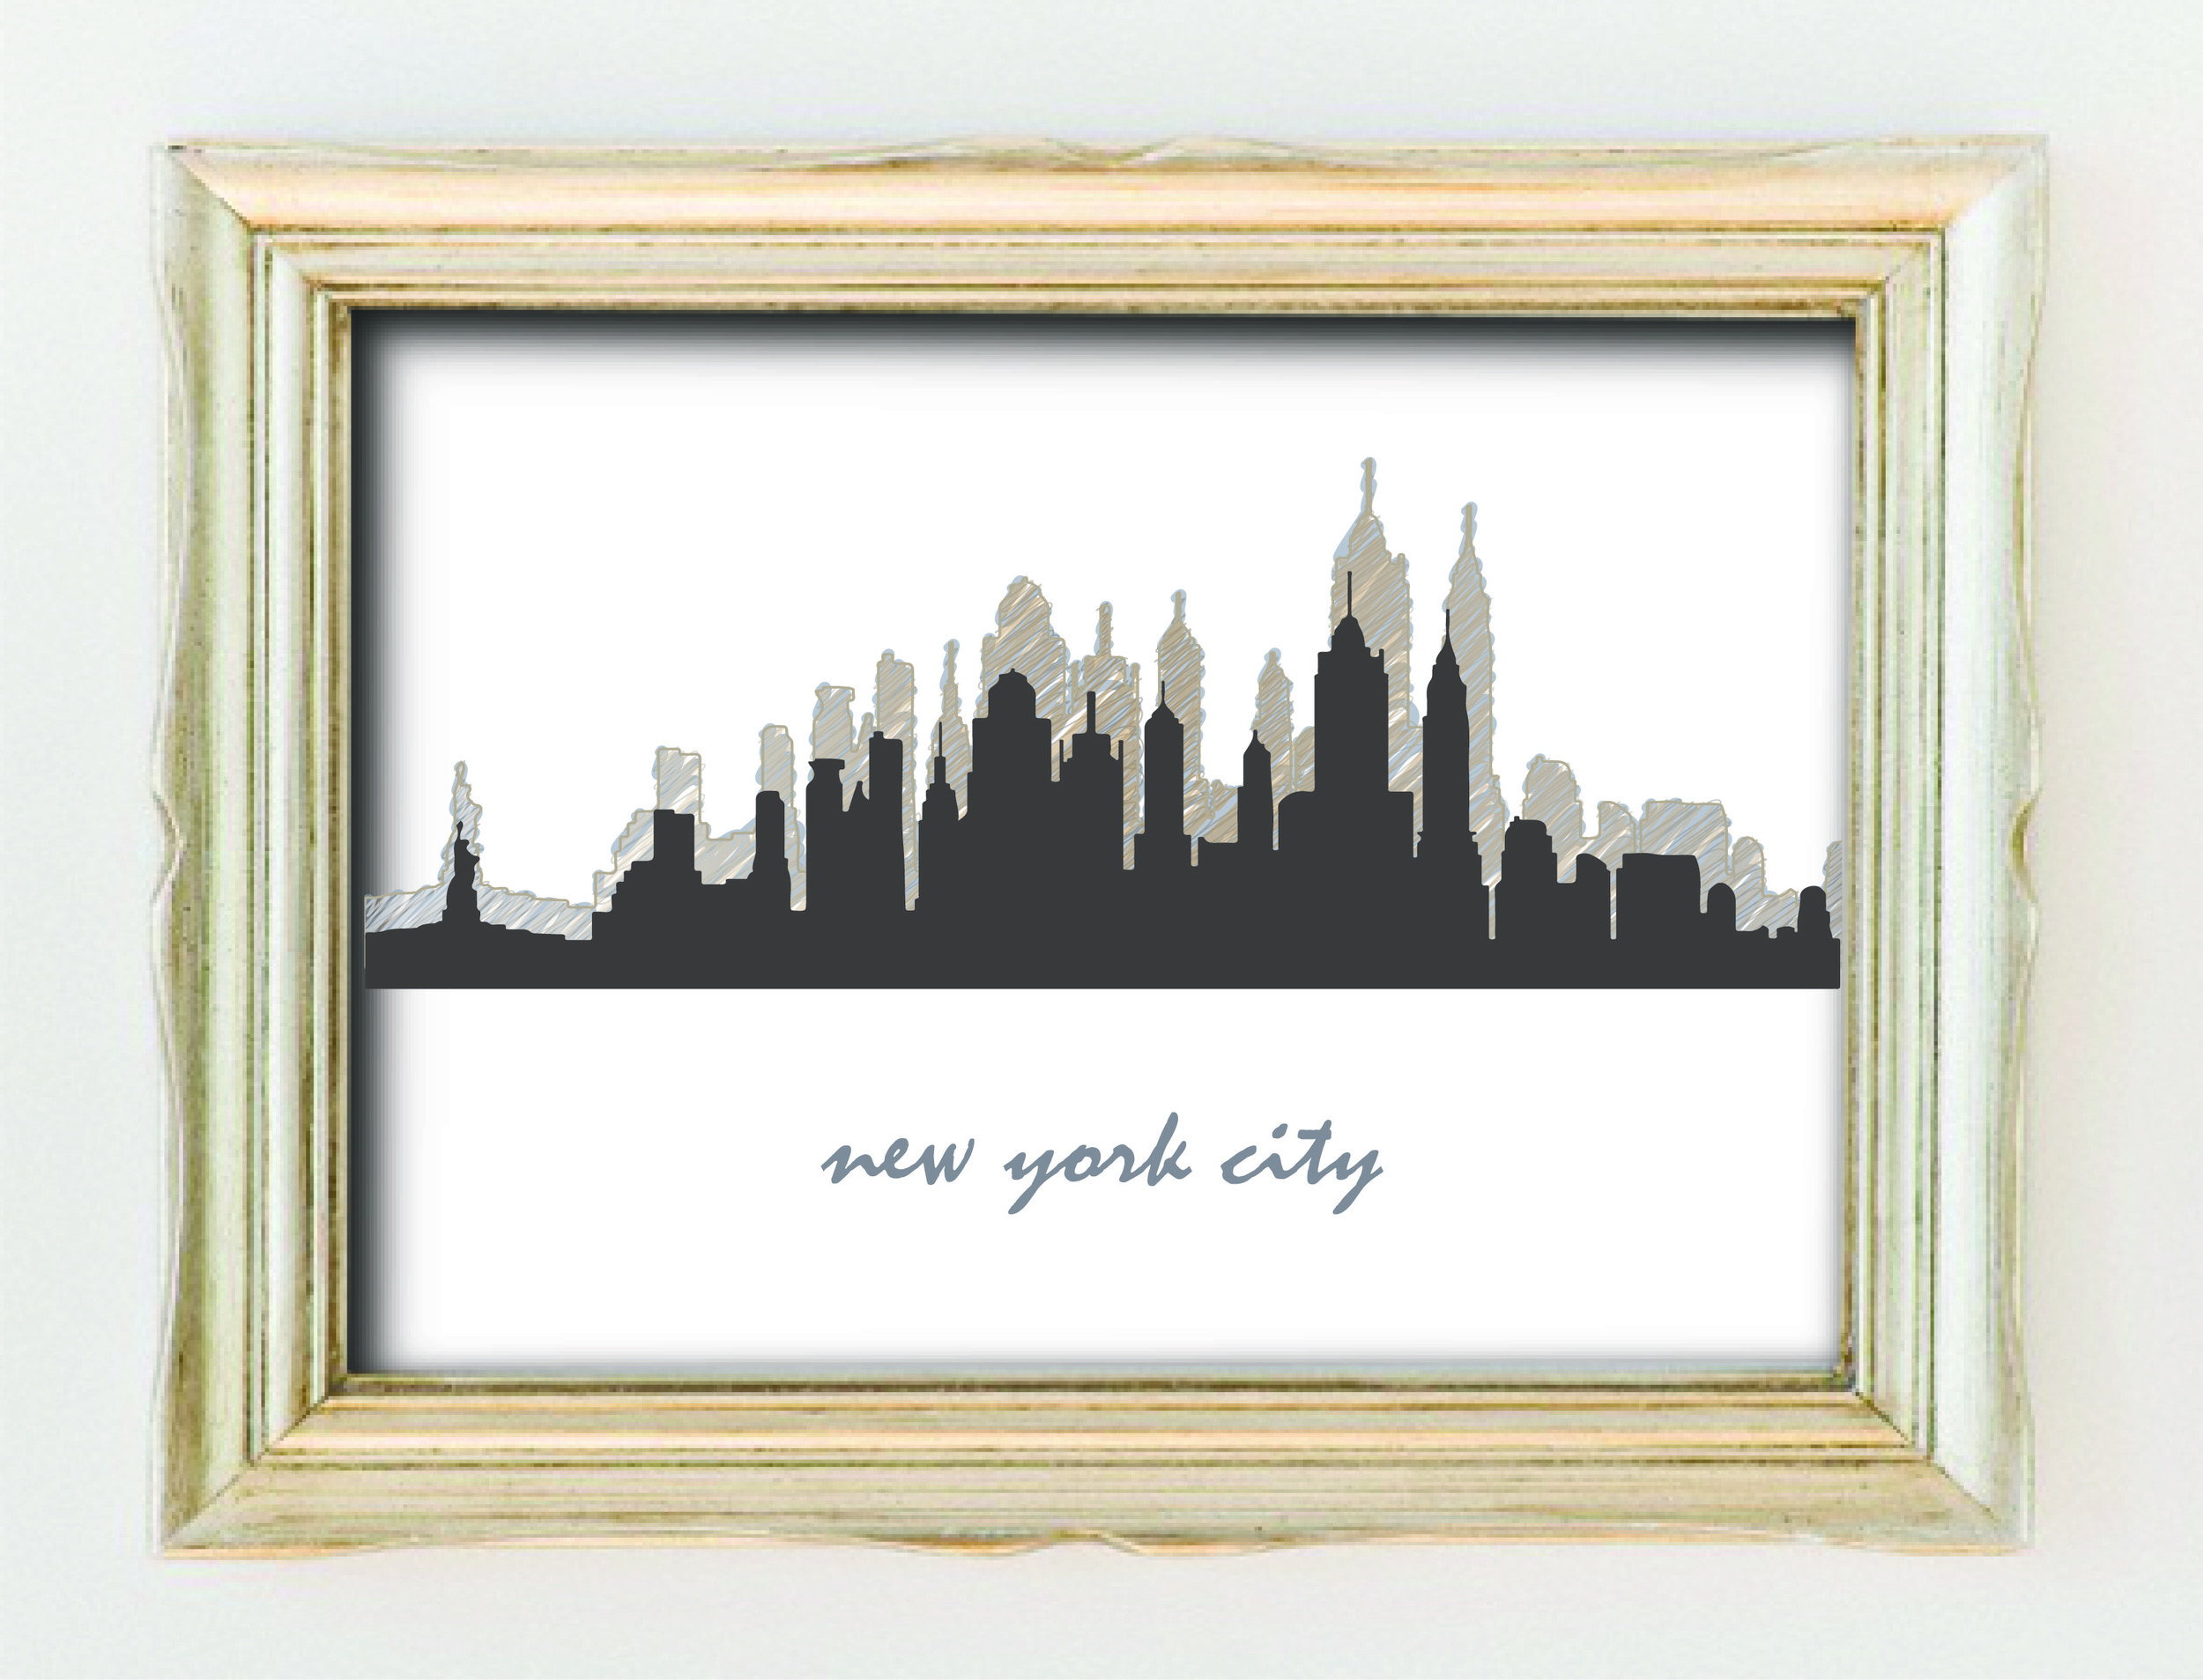 New York Artwork Photo.jpg